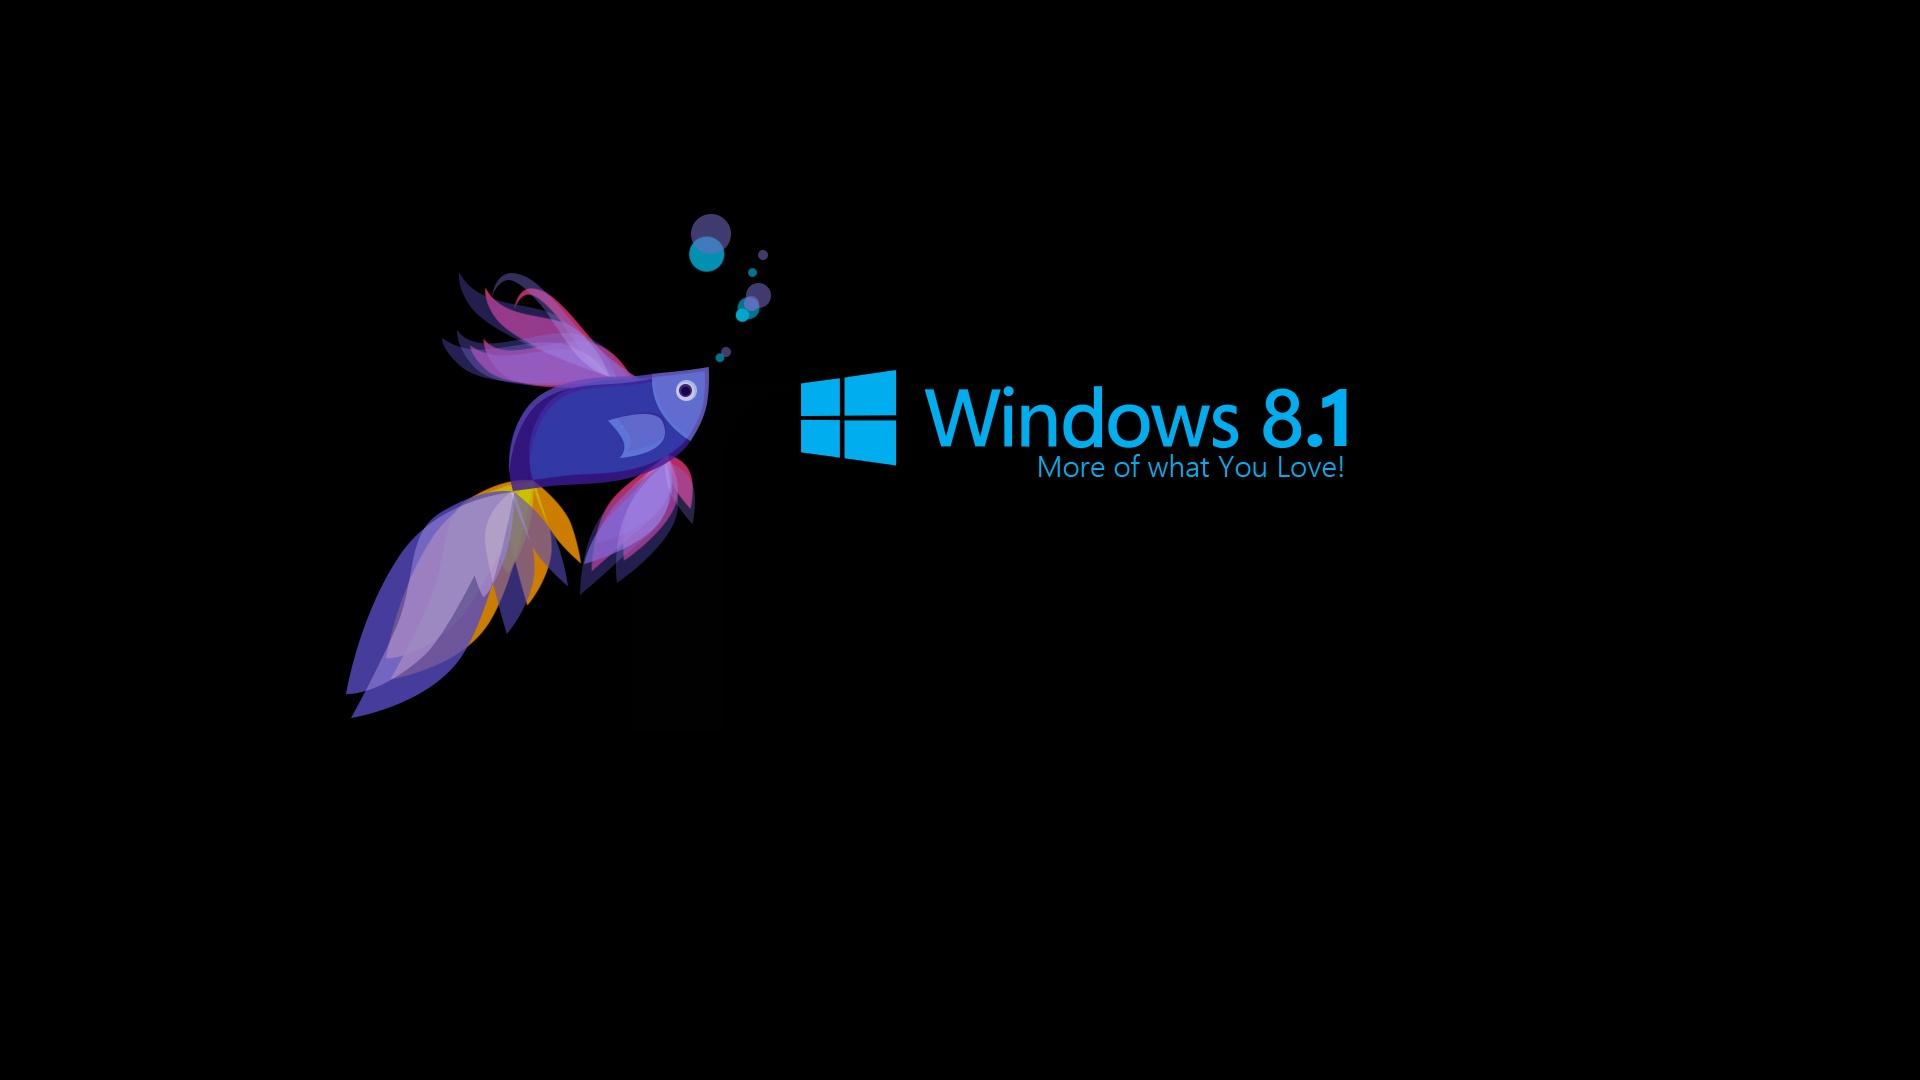 Windows 81 Fish Wallpaper   MixHD wallpapers 1920x1080